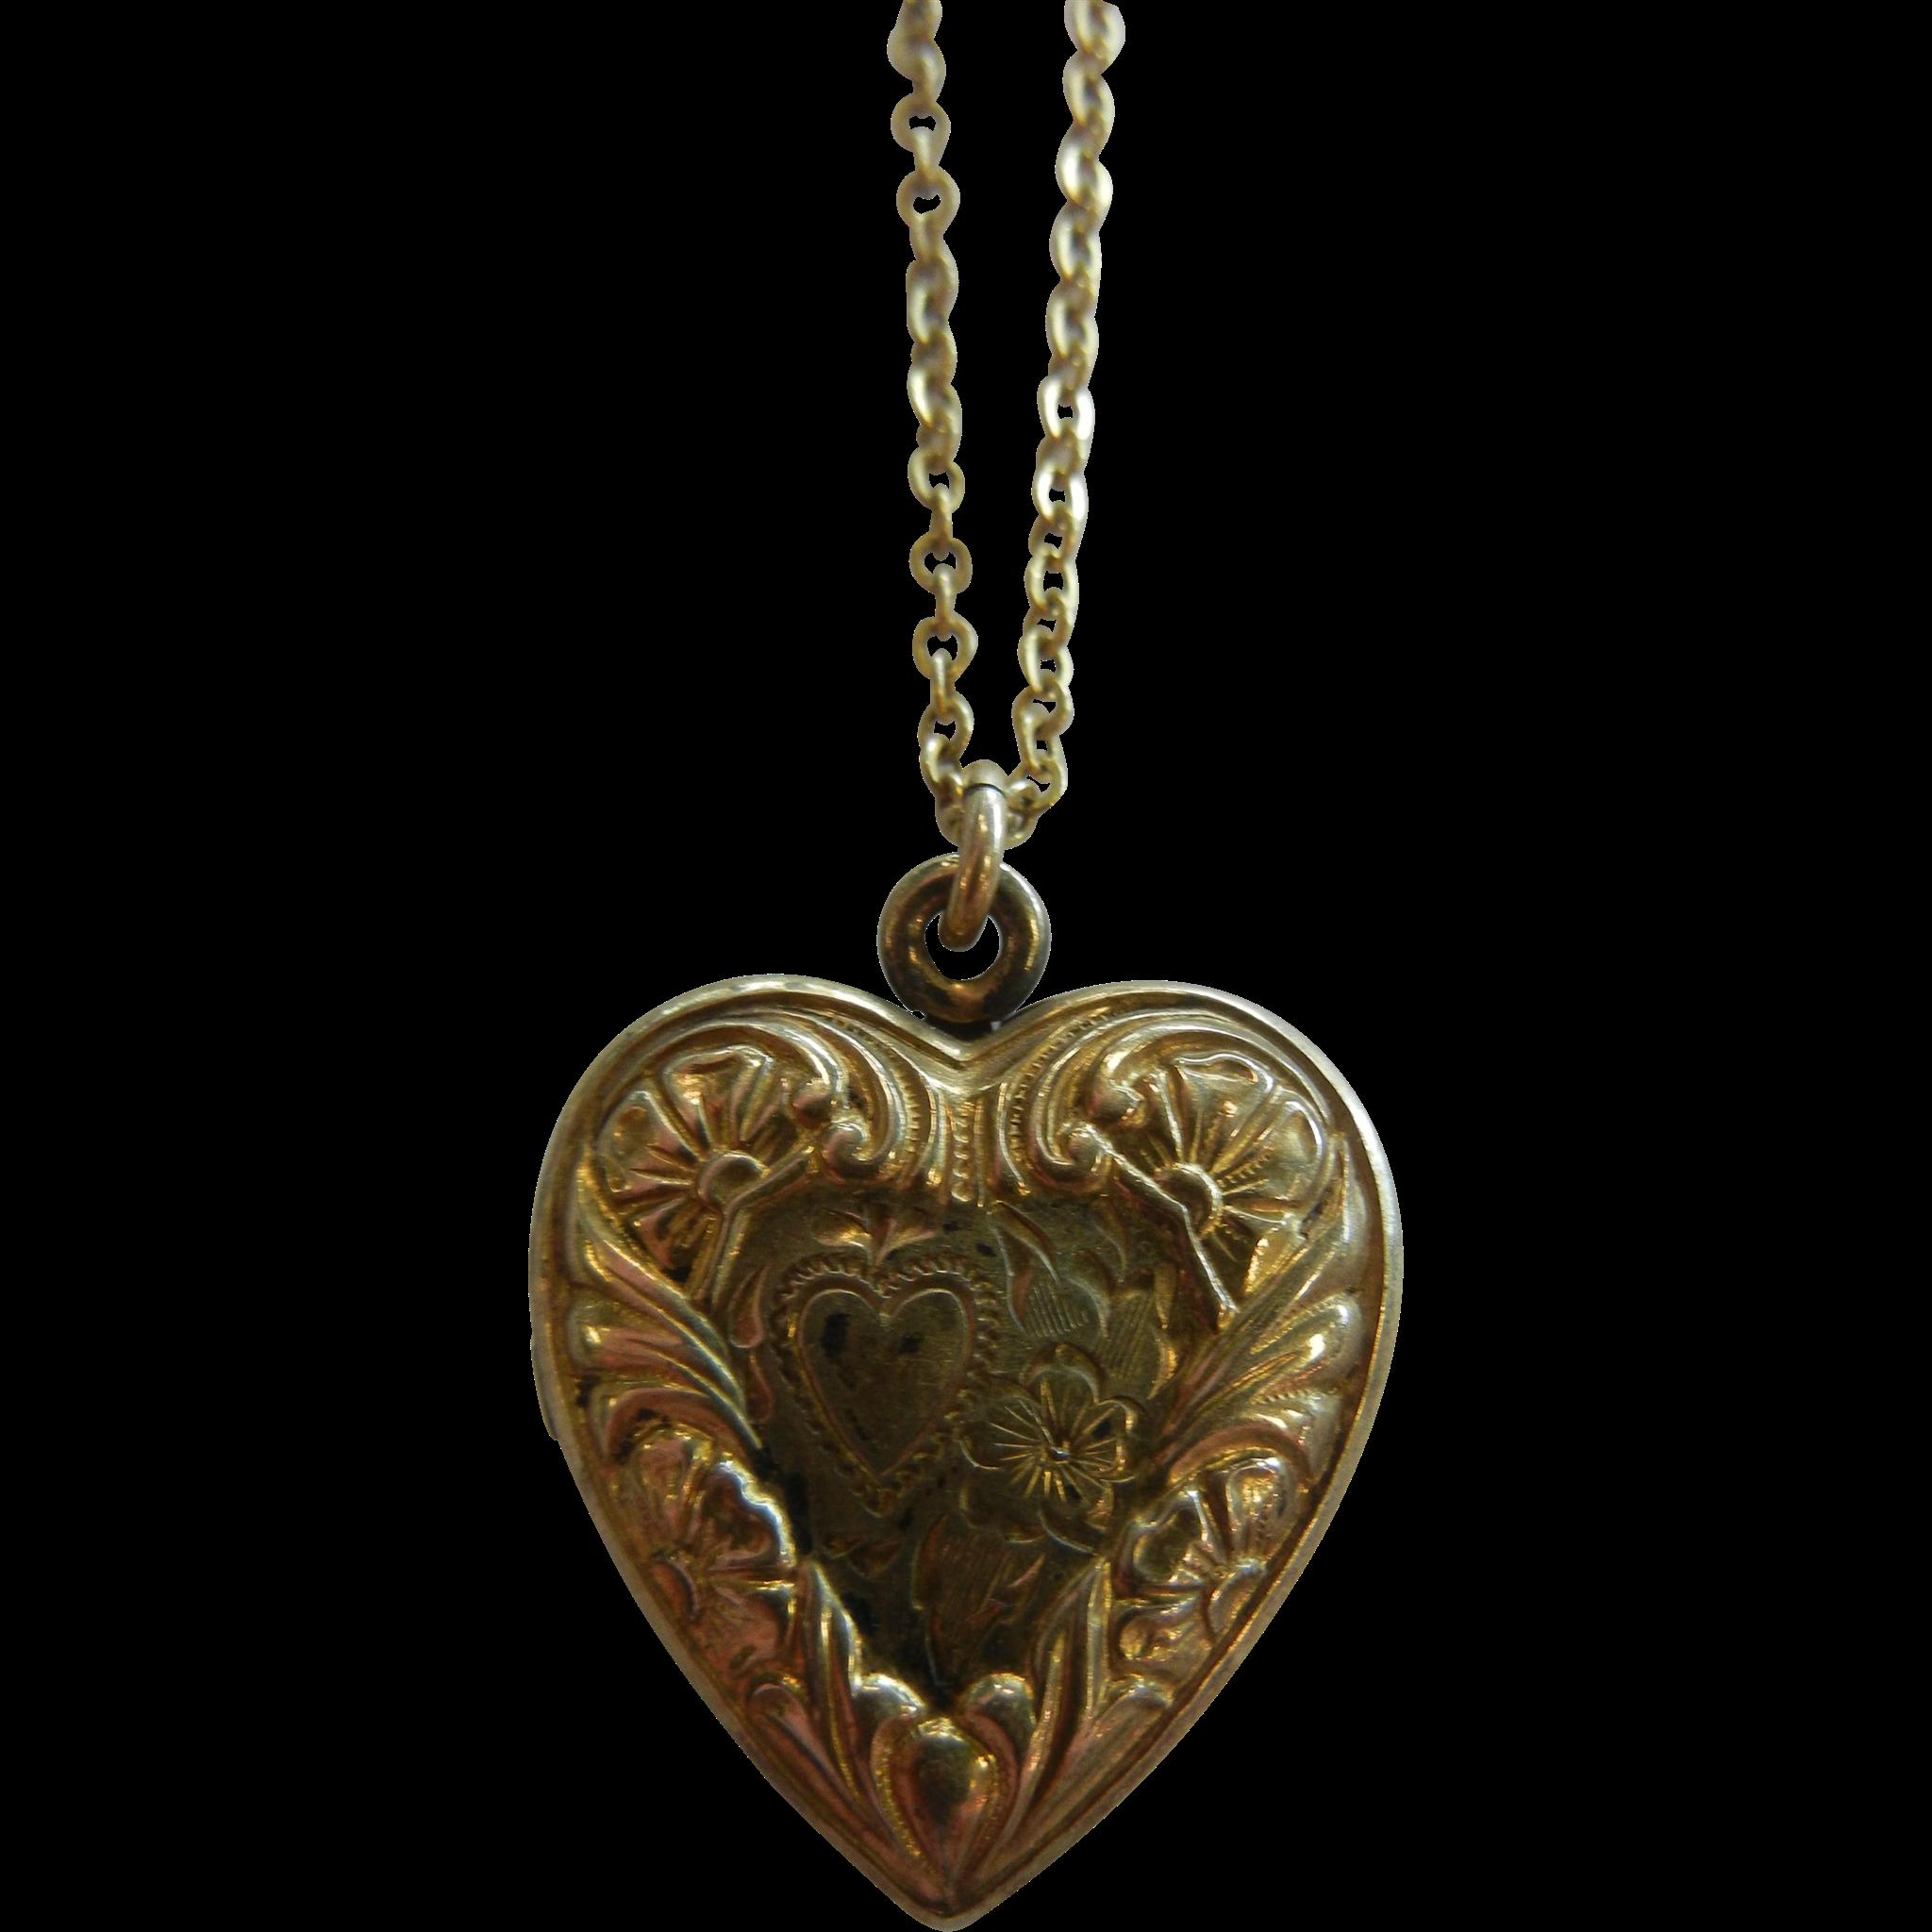 Vintage 10K GF Silver Heart-Shaped Locket Pendent Necklace